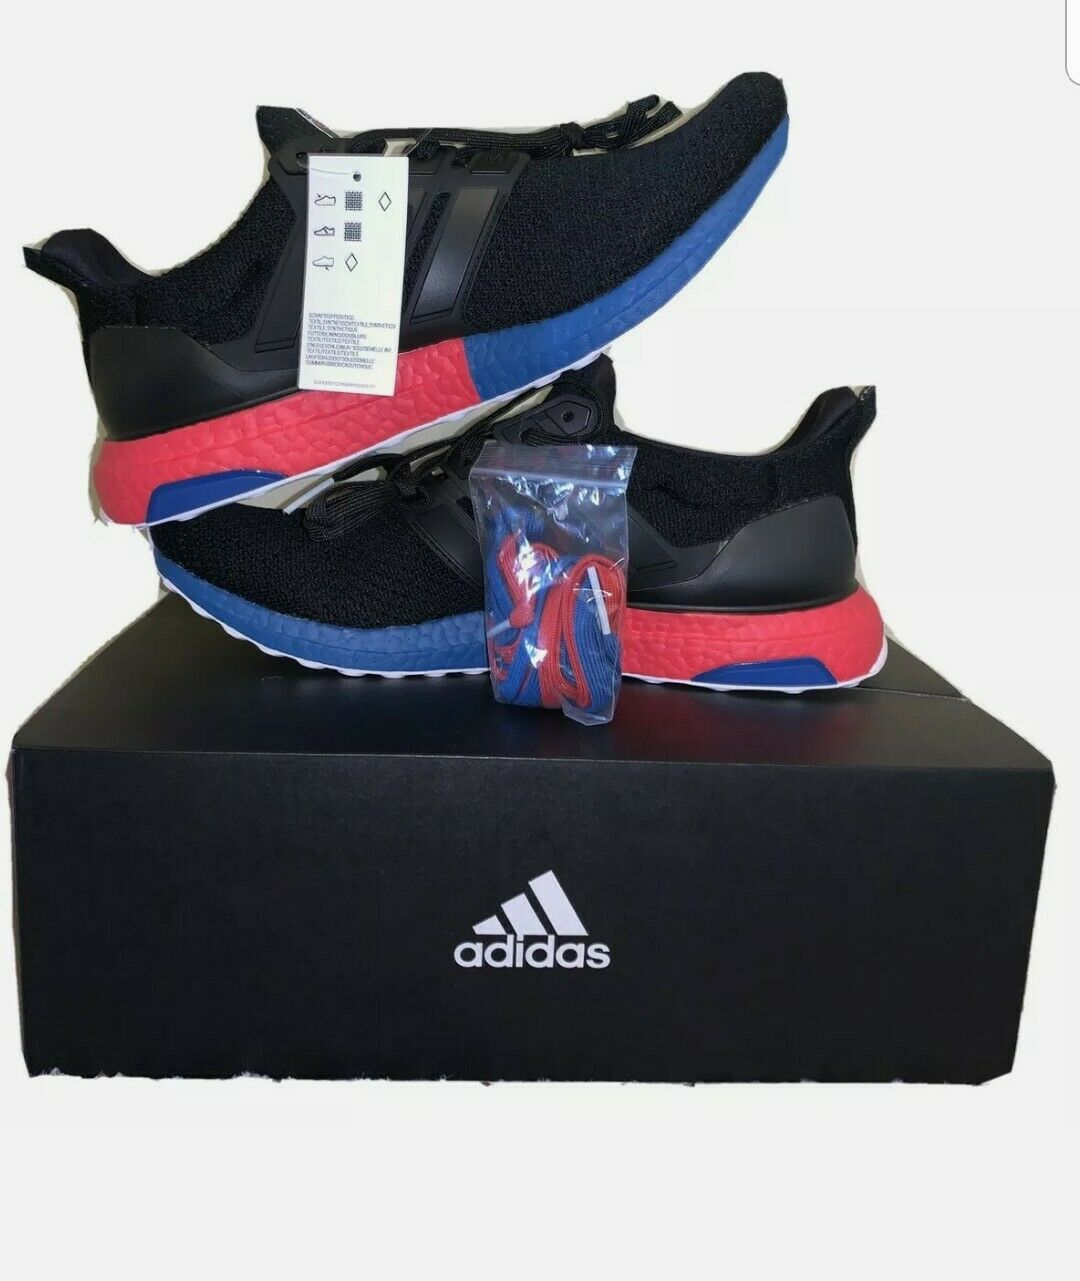 Adidas Ultra Boost Dna Split Midsole Black